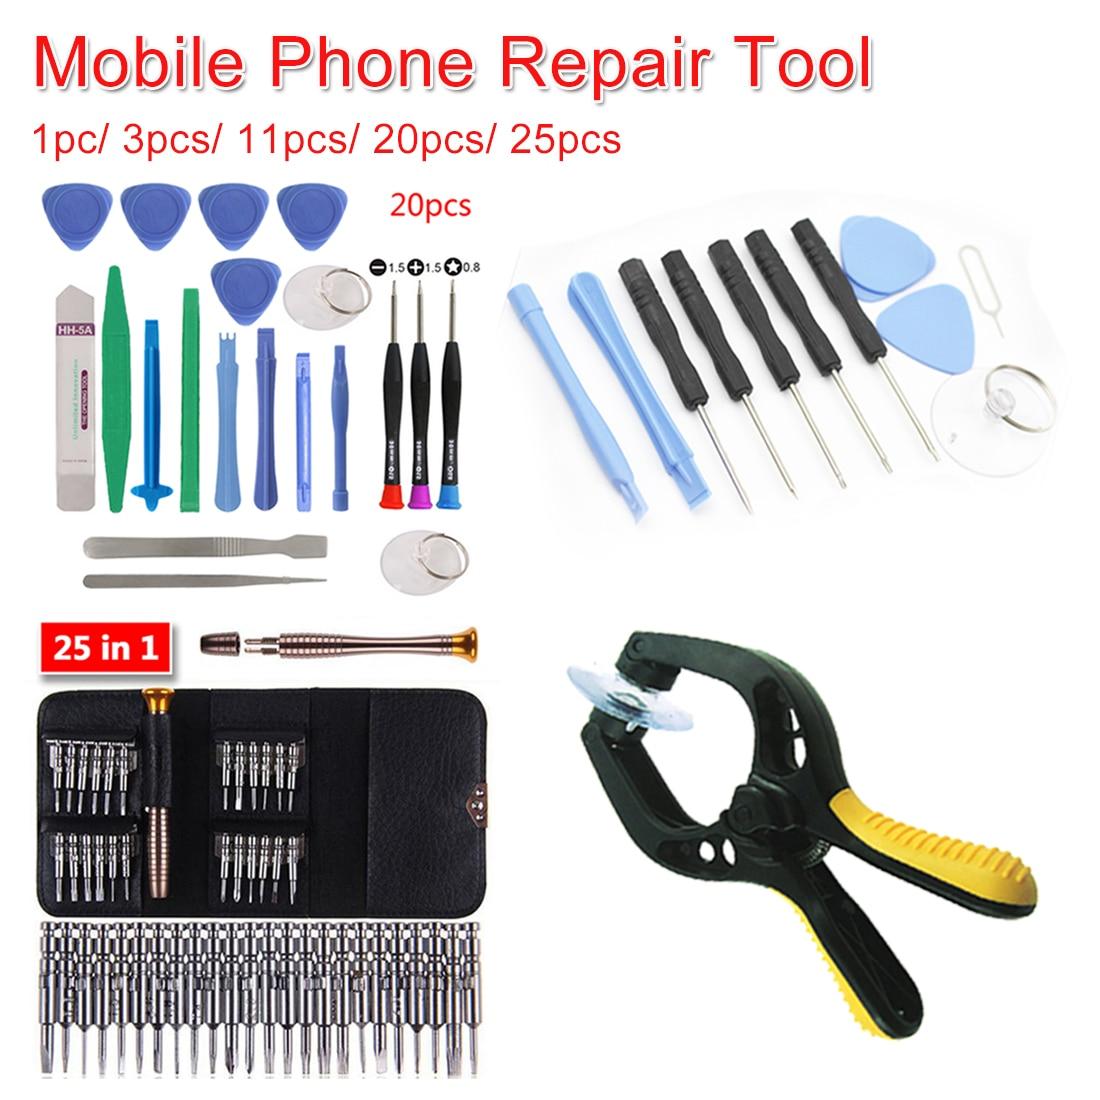 3pcs/11pcs/20pcs/25pcs Cell Phones Opening Pry Mobile Phone Repair Tool Kit Screwdriver Set For Iphone/Samsung/Xiaomi Accessory